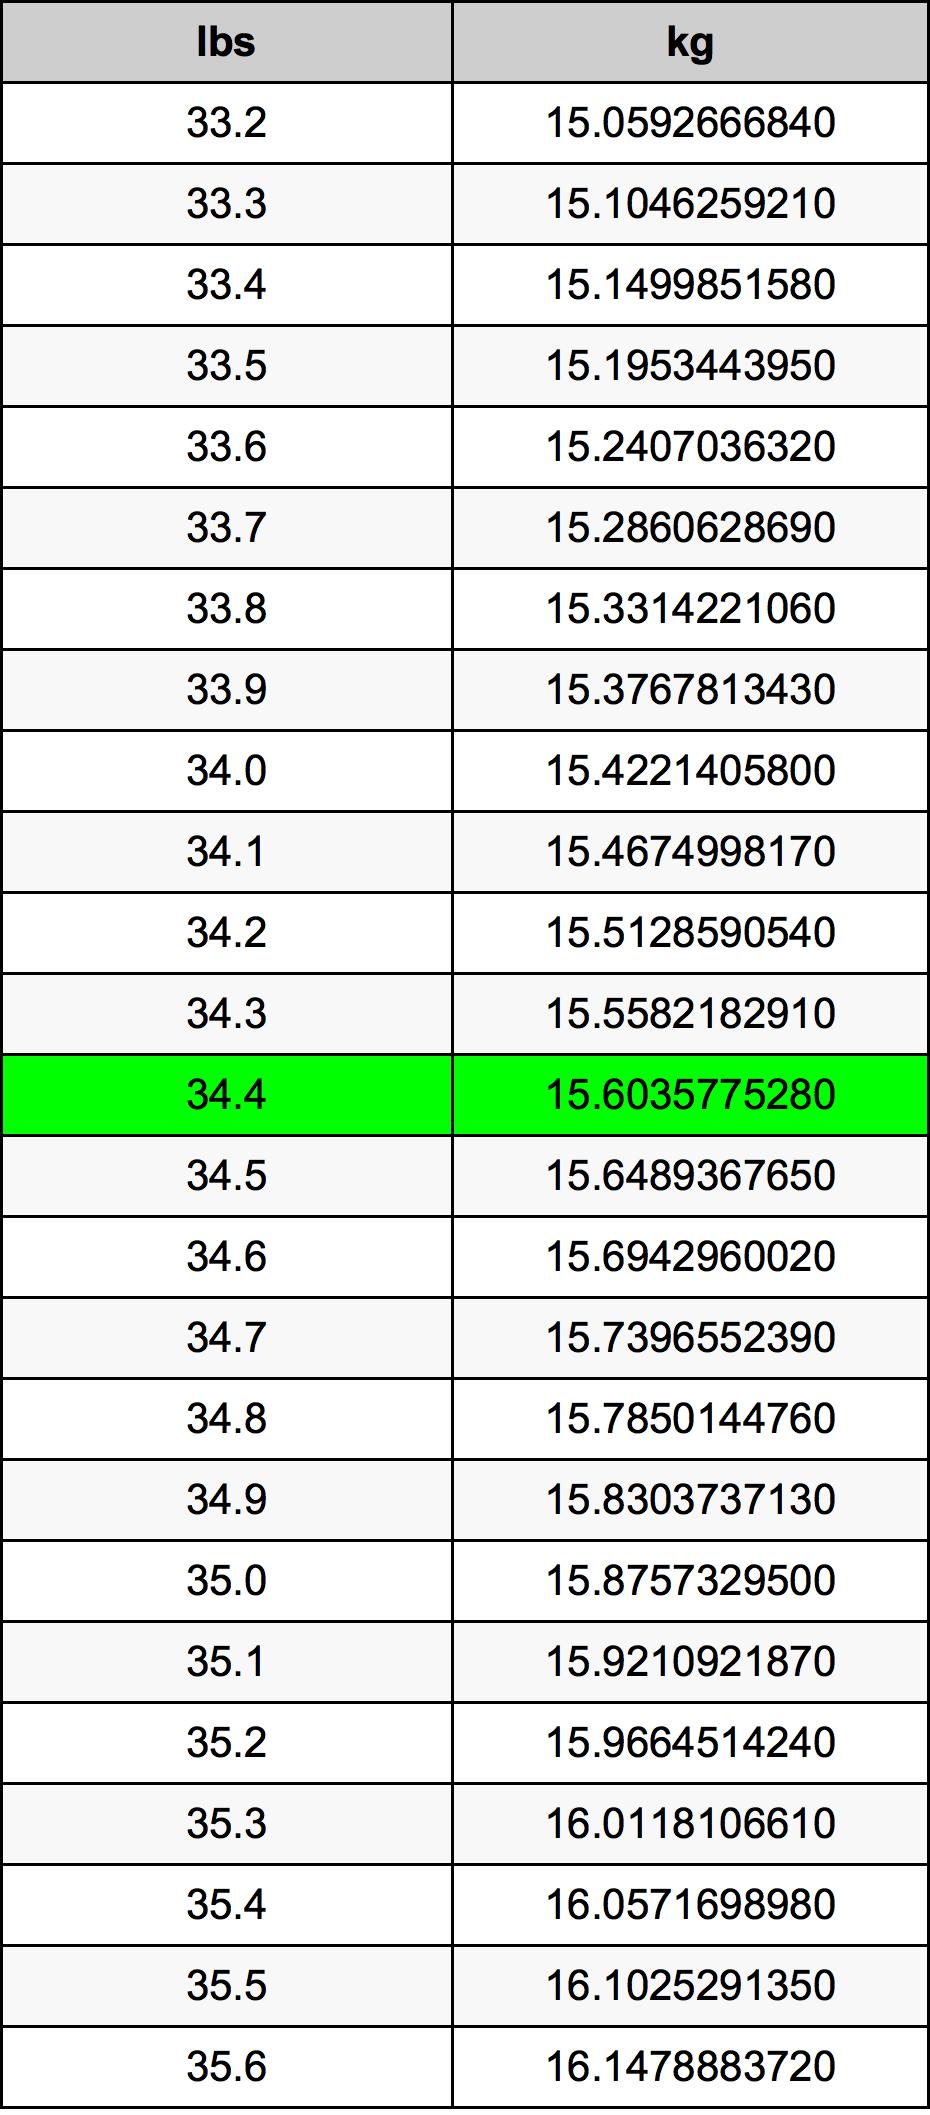 34.4 Libra konverteringstabellen